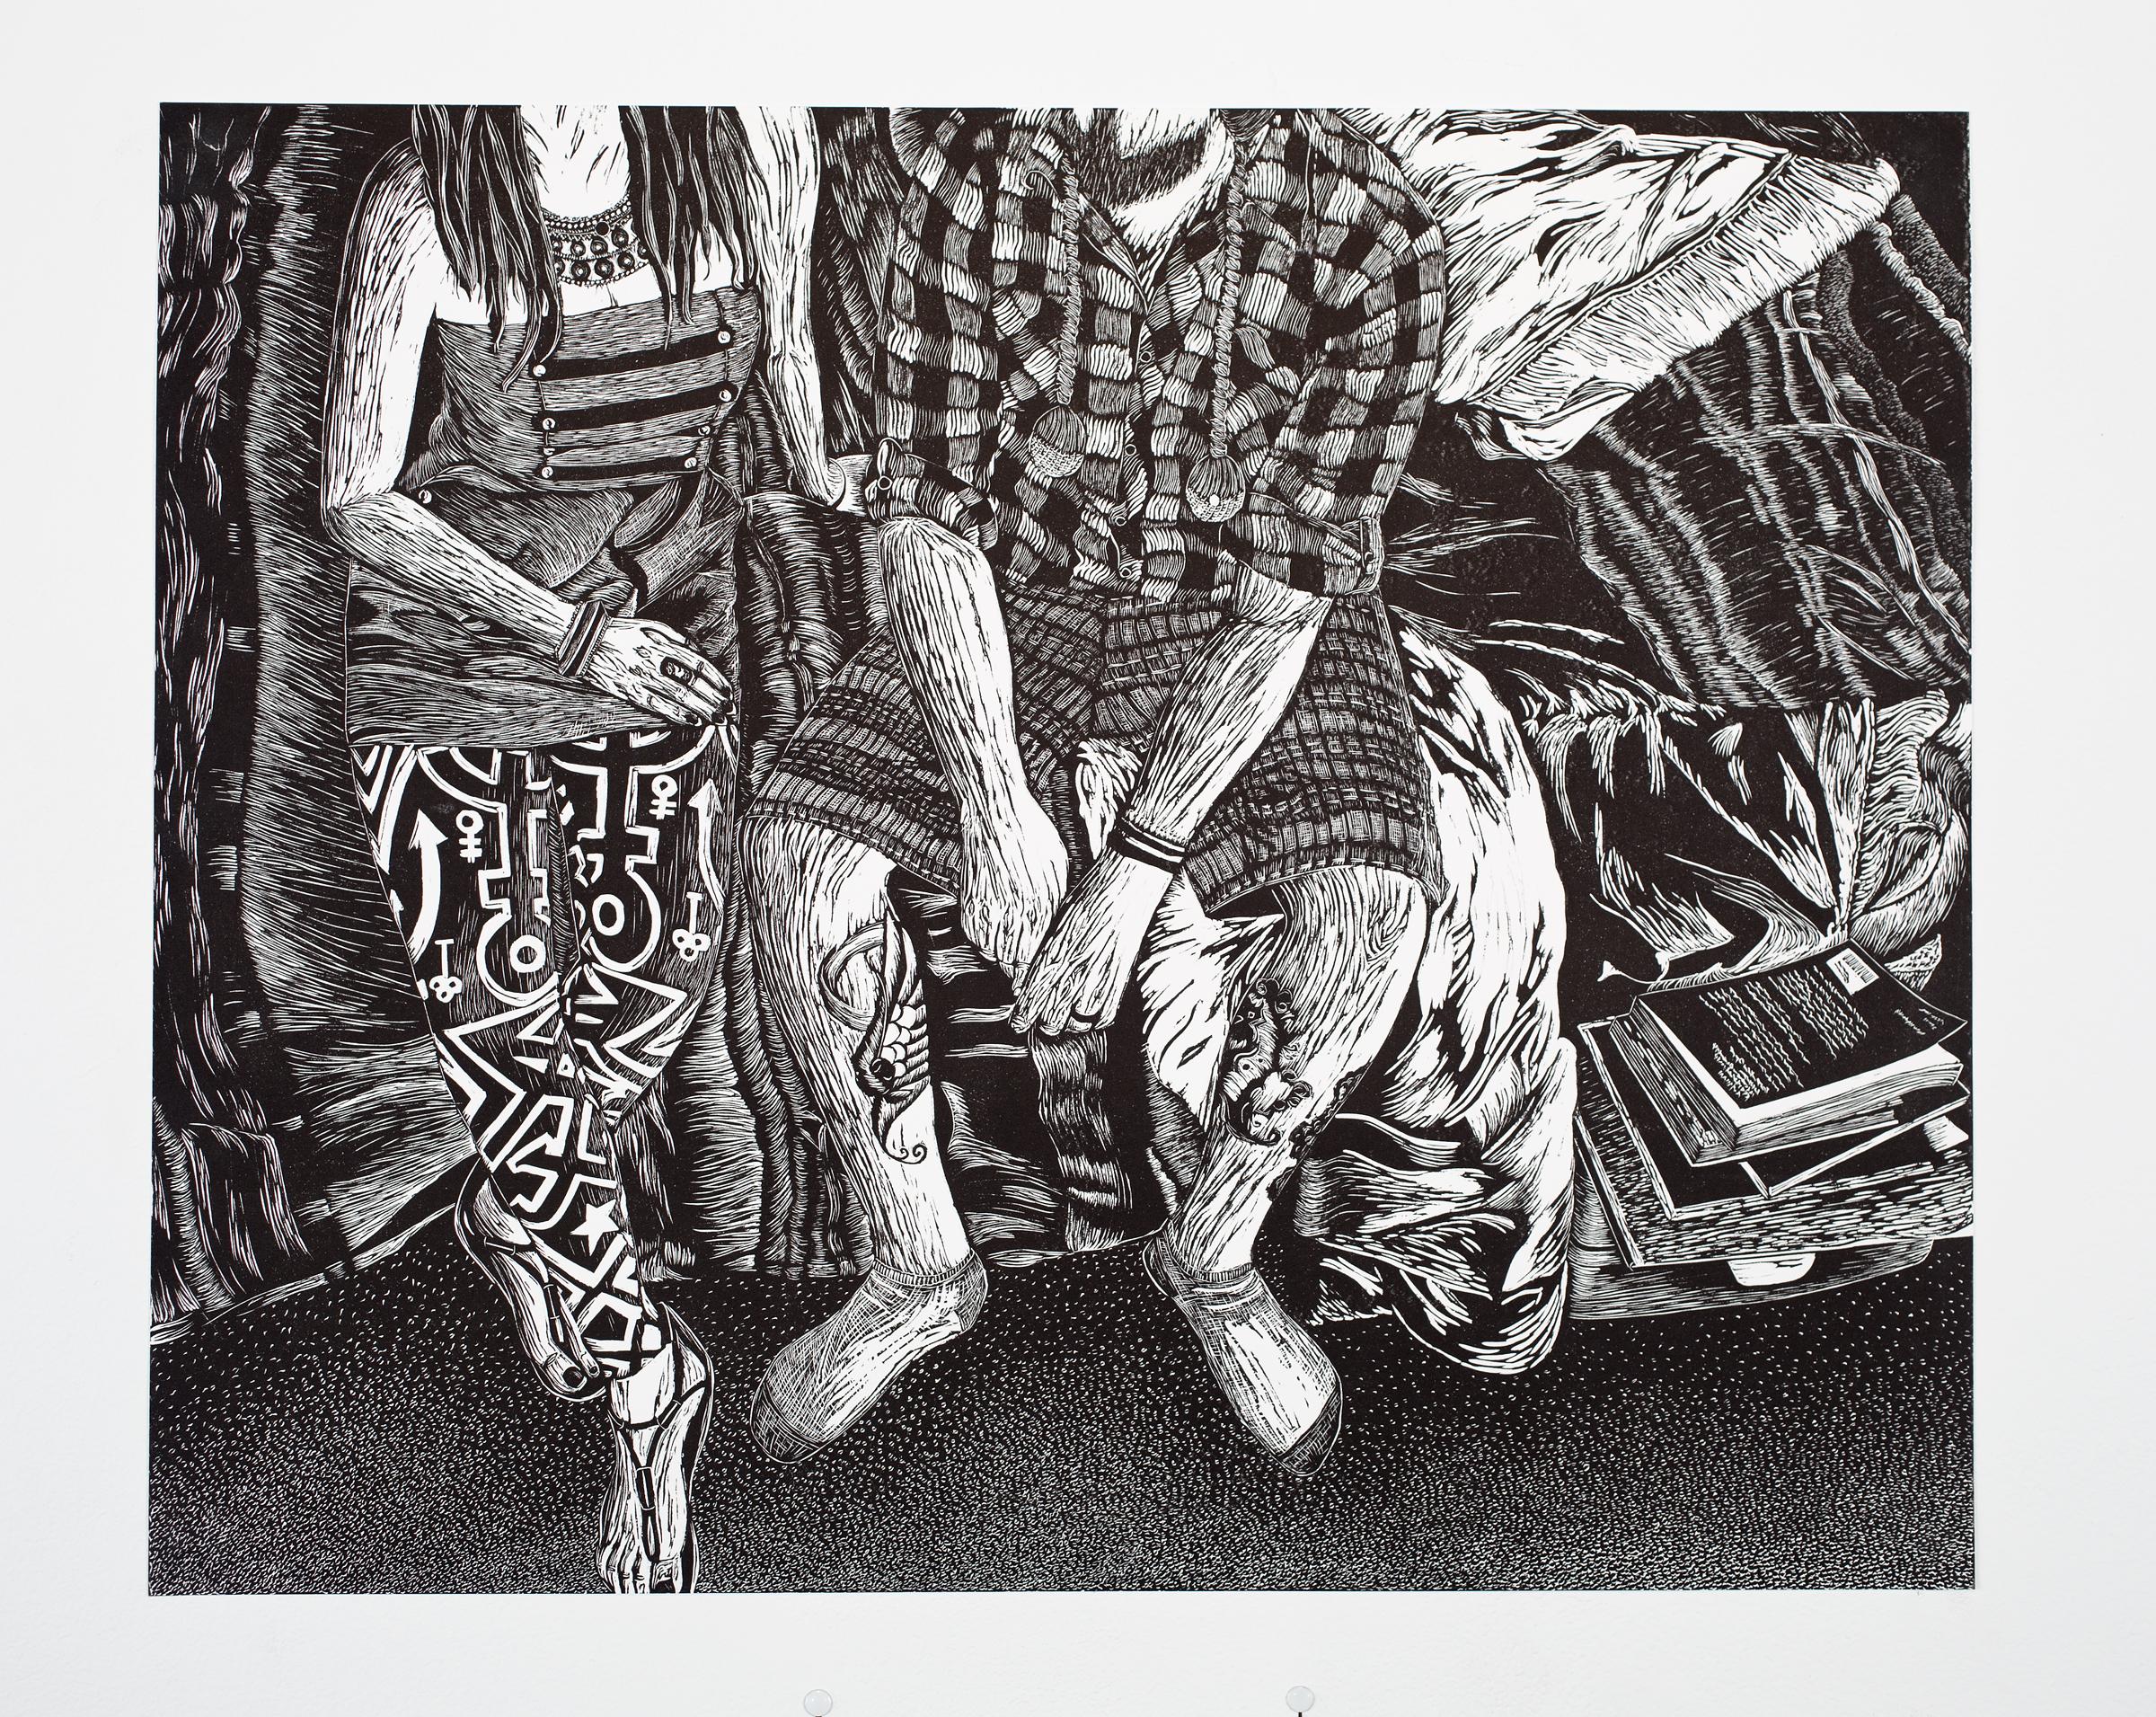 """Articulate Apparel"", linoleum relief, 20x24"